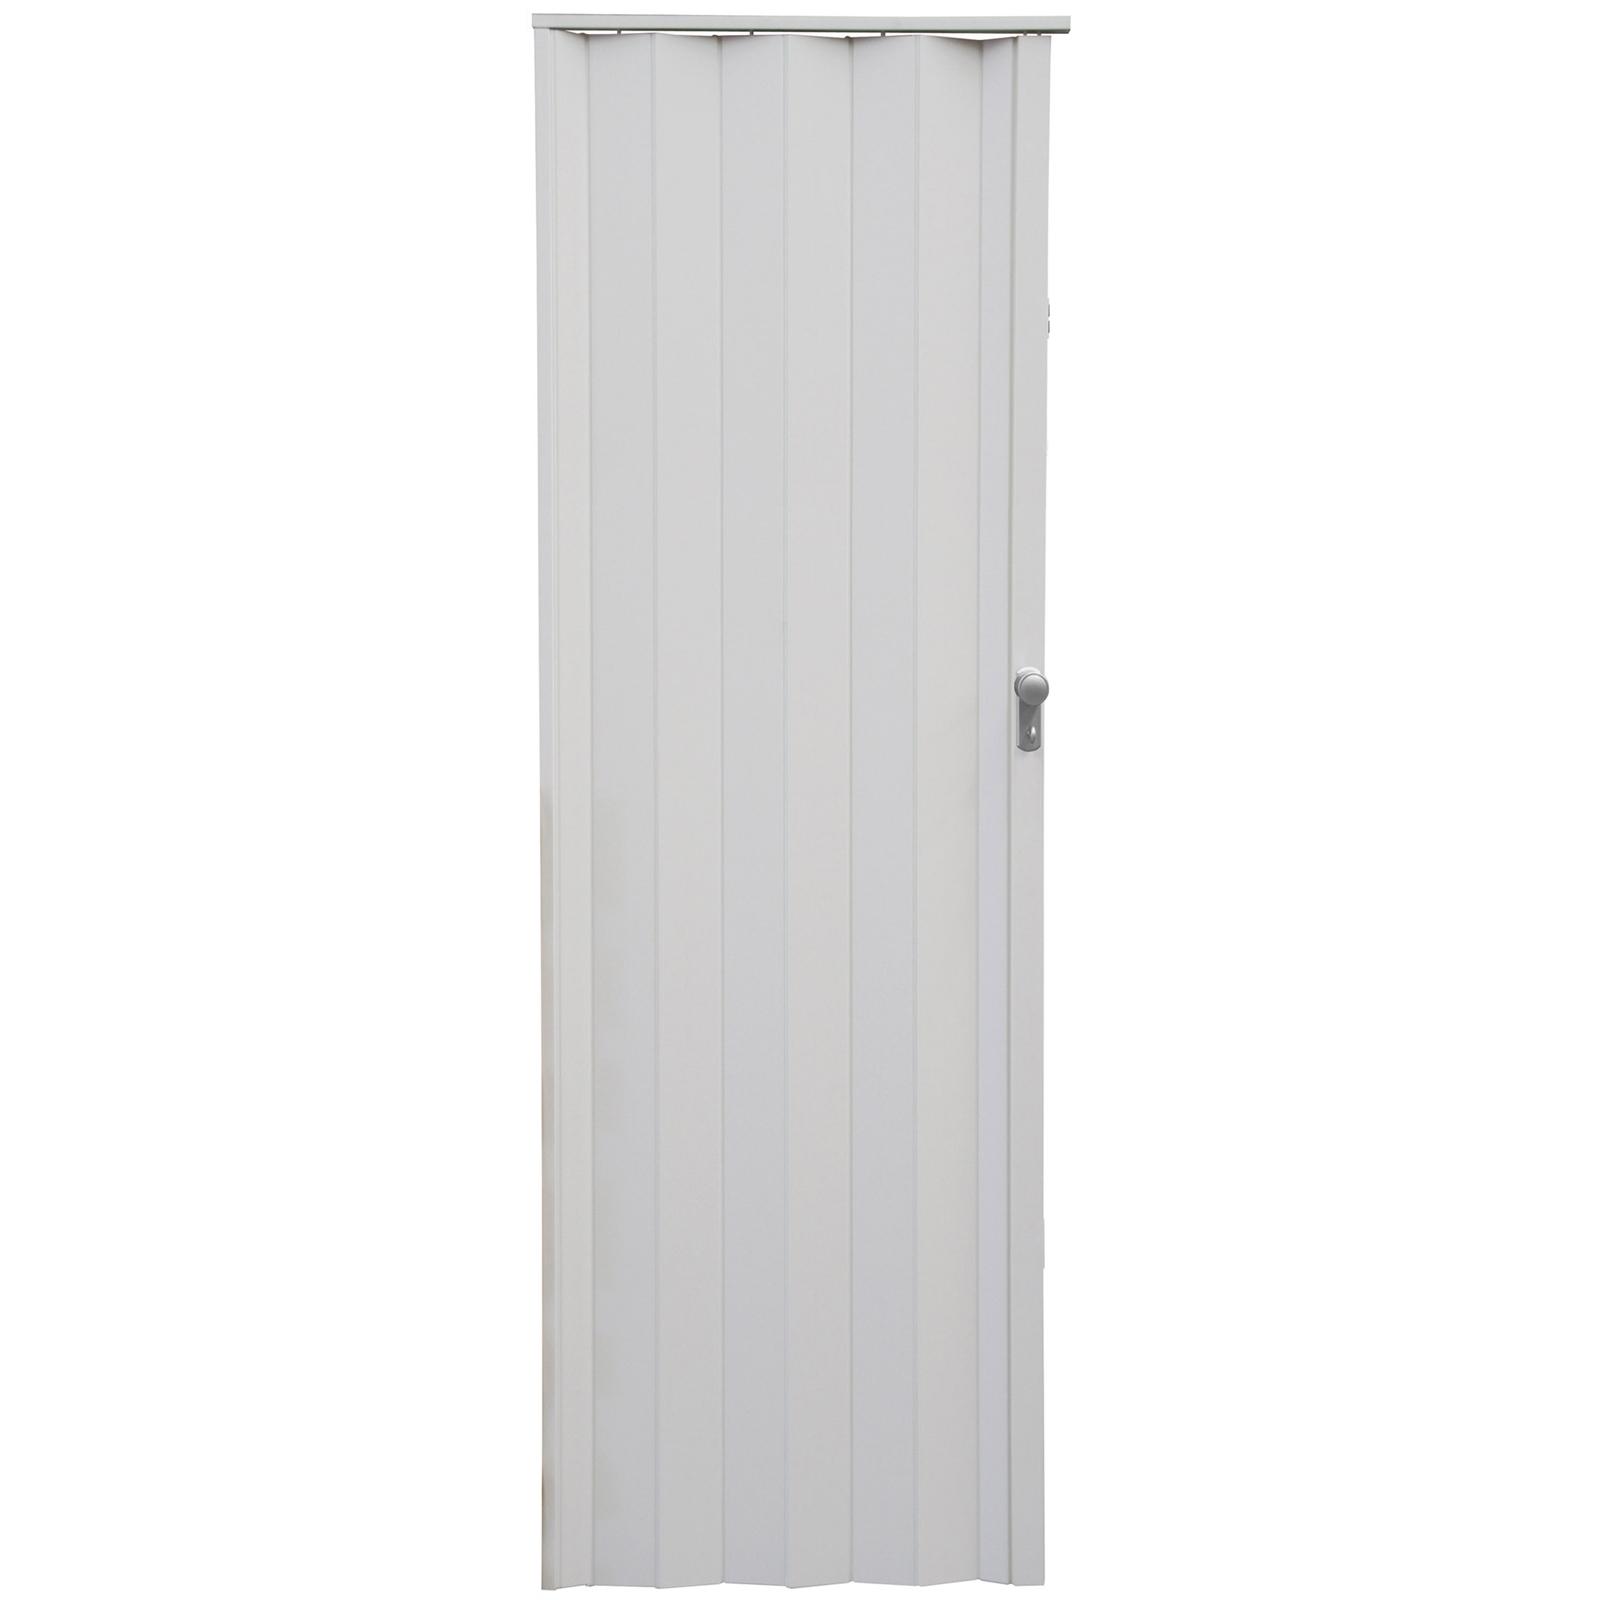 Pillar Products 82 x 240cm White PVC Havana Concertina Door